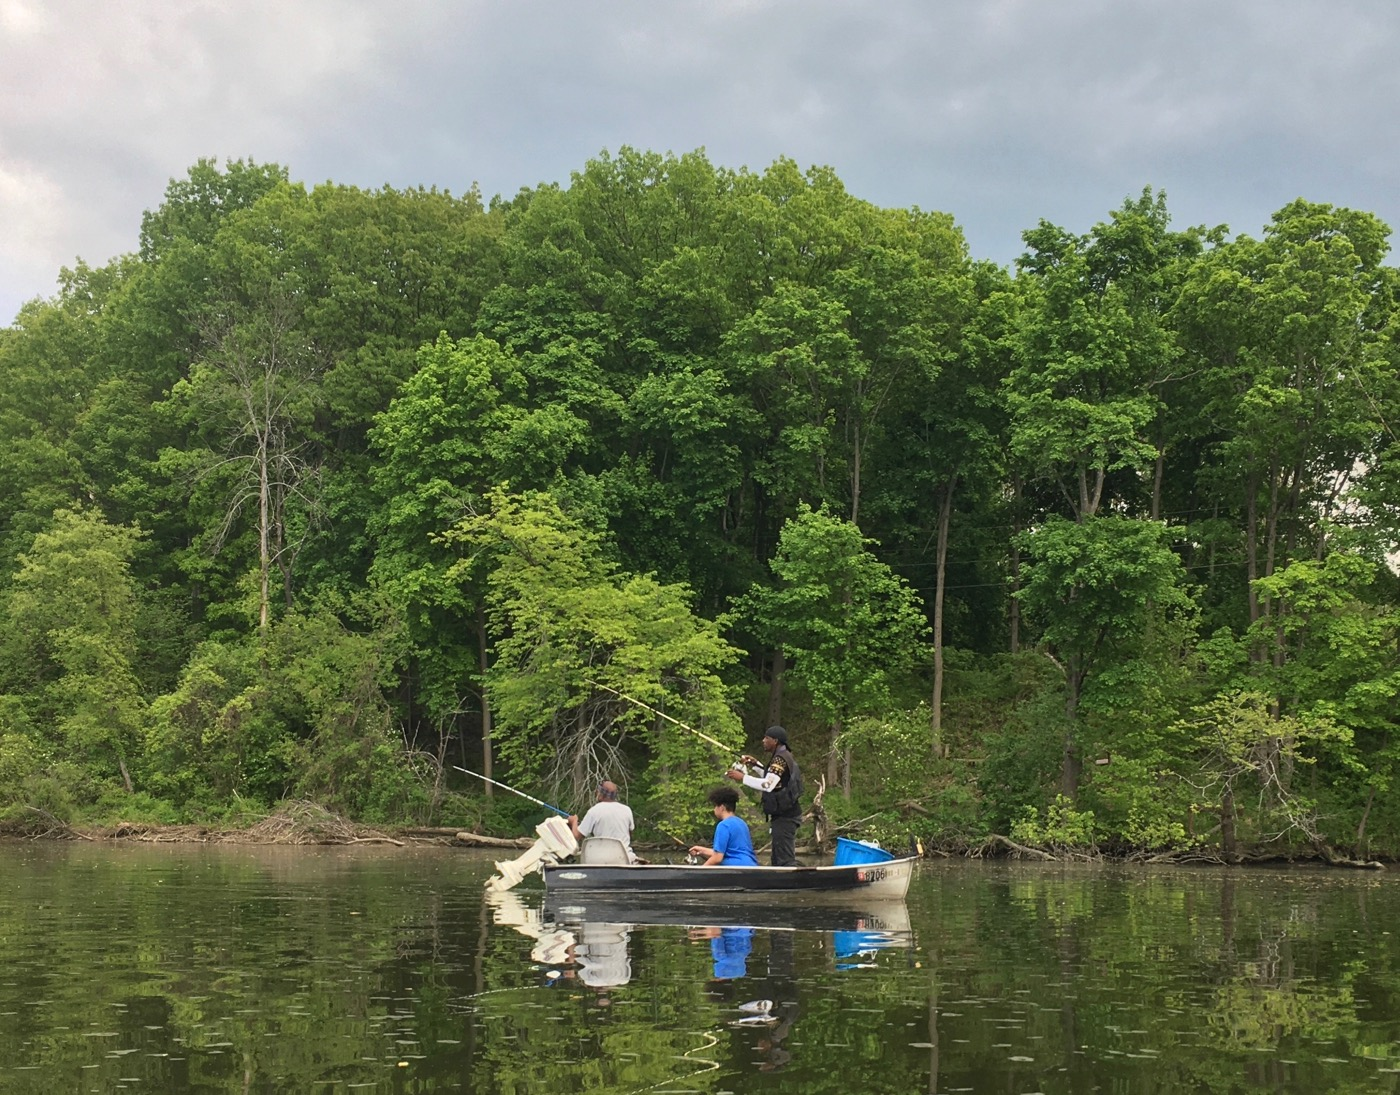 Fishkill Creek fishermen